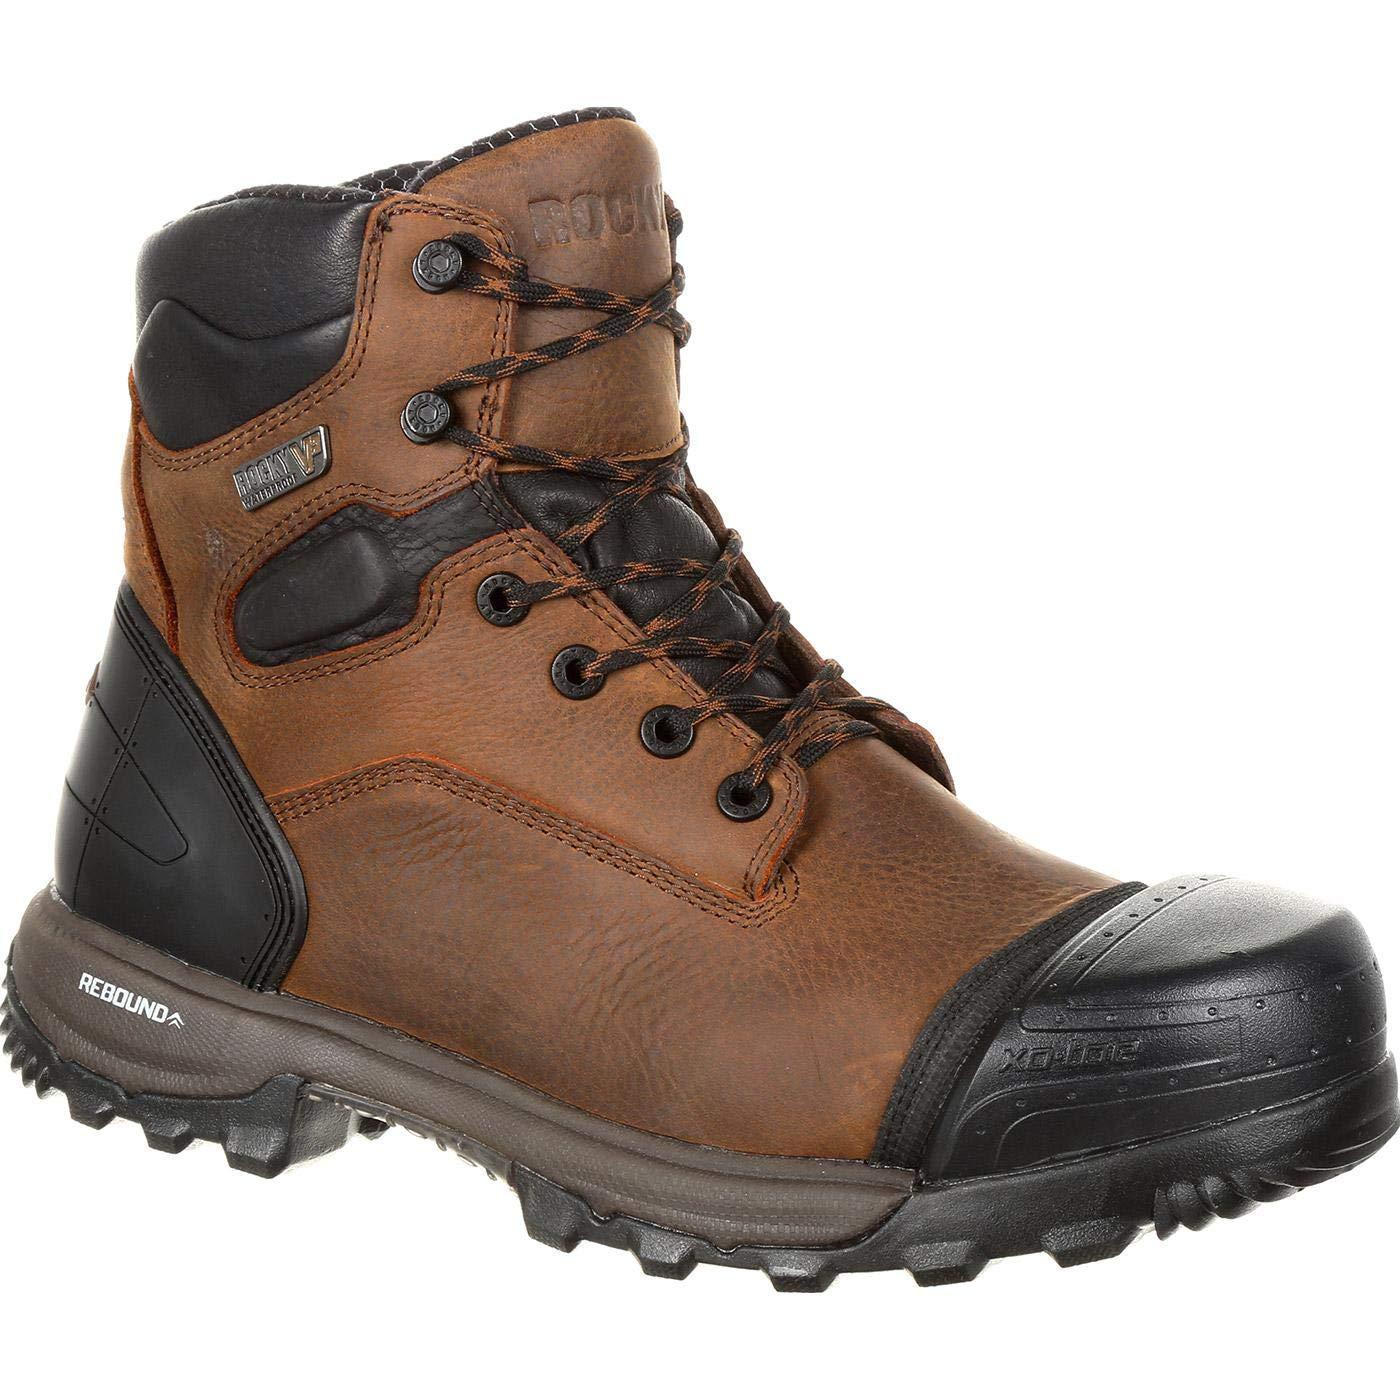 Rocky Men's Xo-Toe Waterproof Work Boot Round Toe Brown 8 D